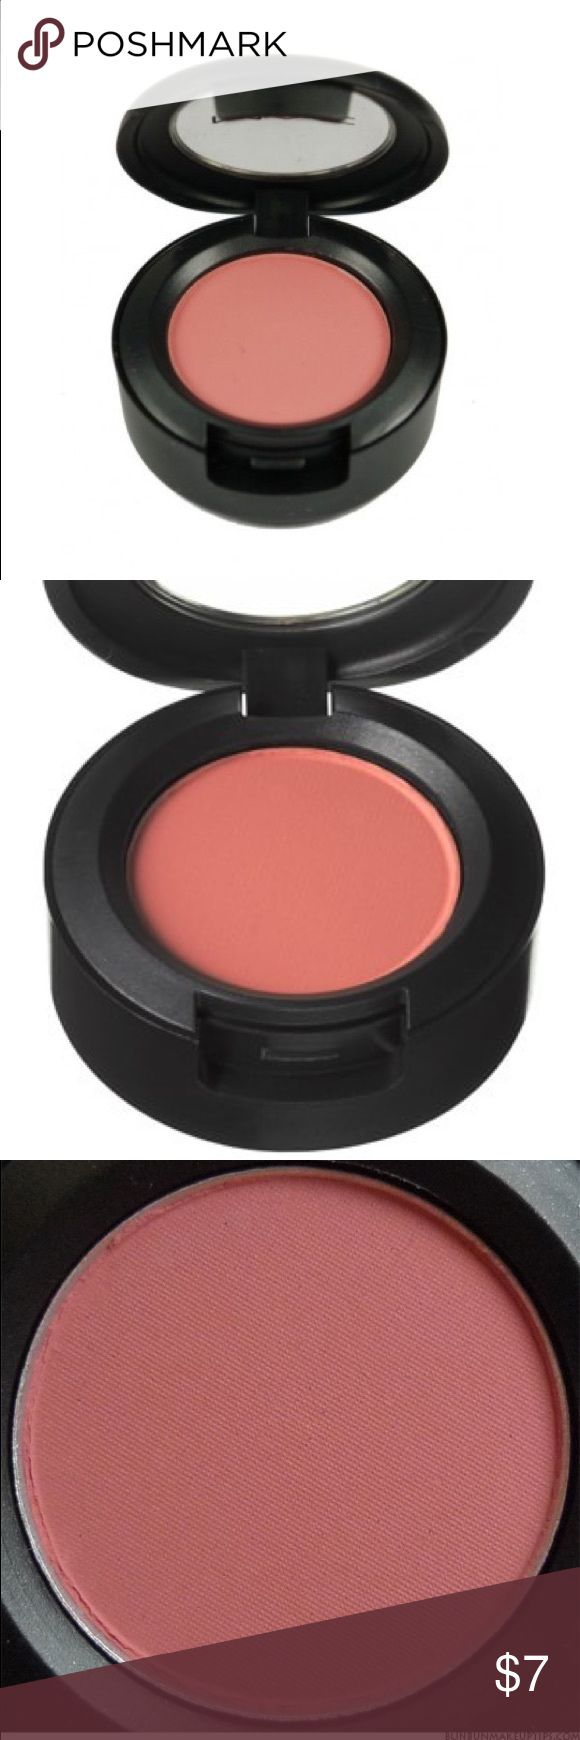 MAC Cosmetics Eyeshadow In Free To Be | Mac cosmetics ...